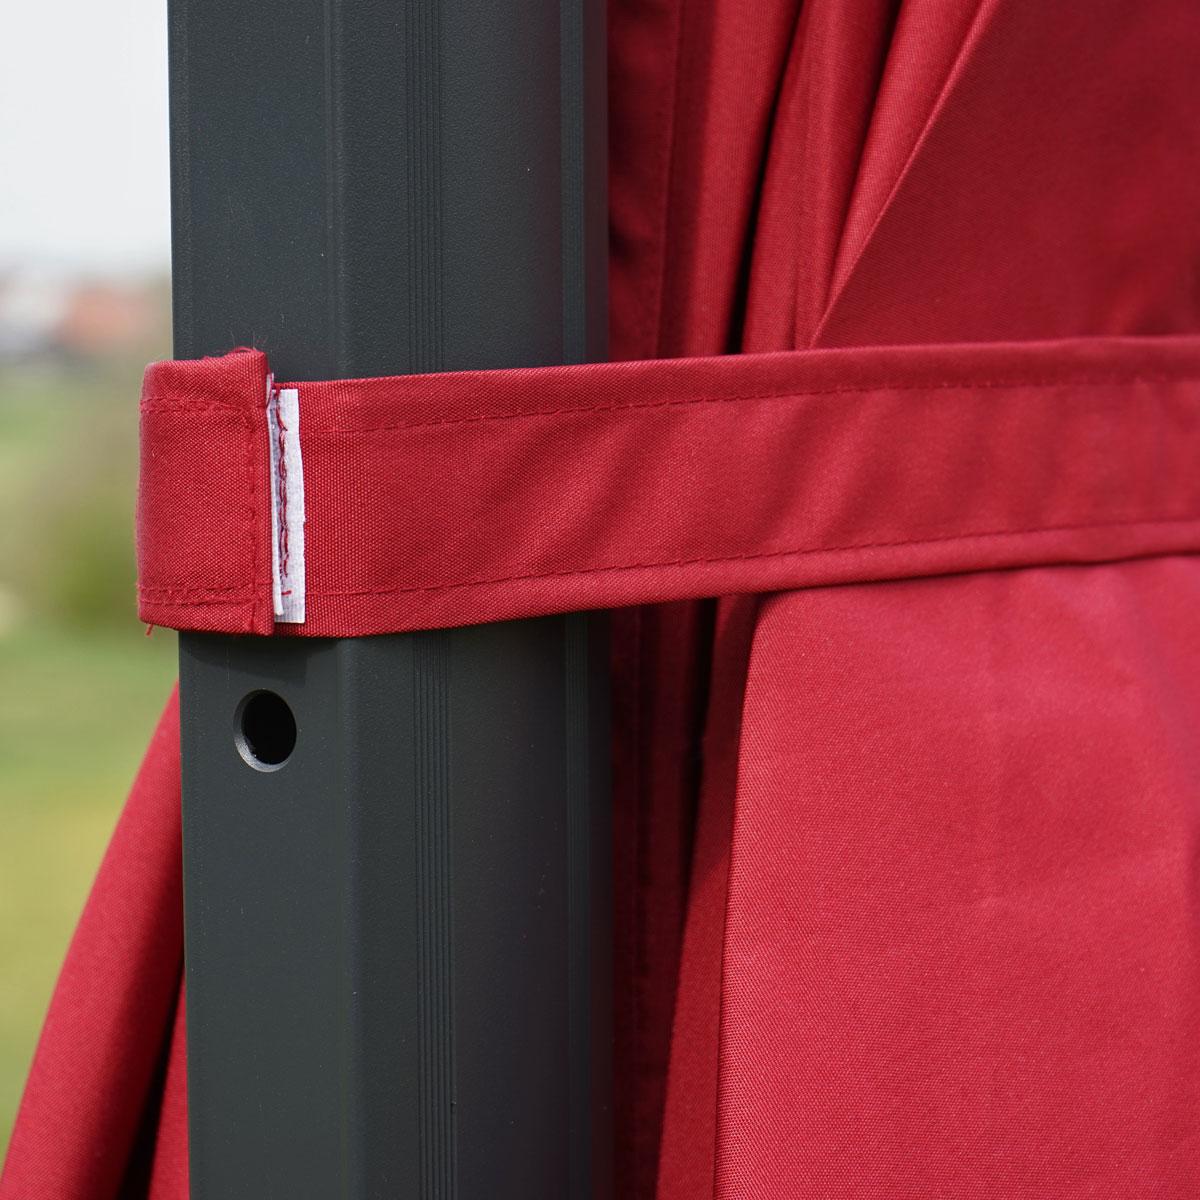 gastronomie luxus ampelschirm sonnenschirm n22 4 3 m. Black Bedroom Furniture Sets. Home Design Ideas